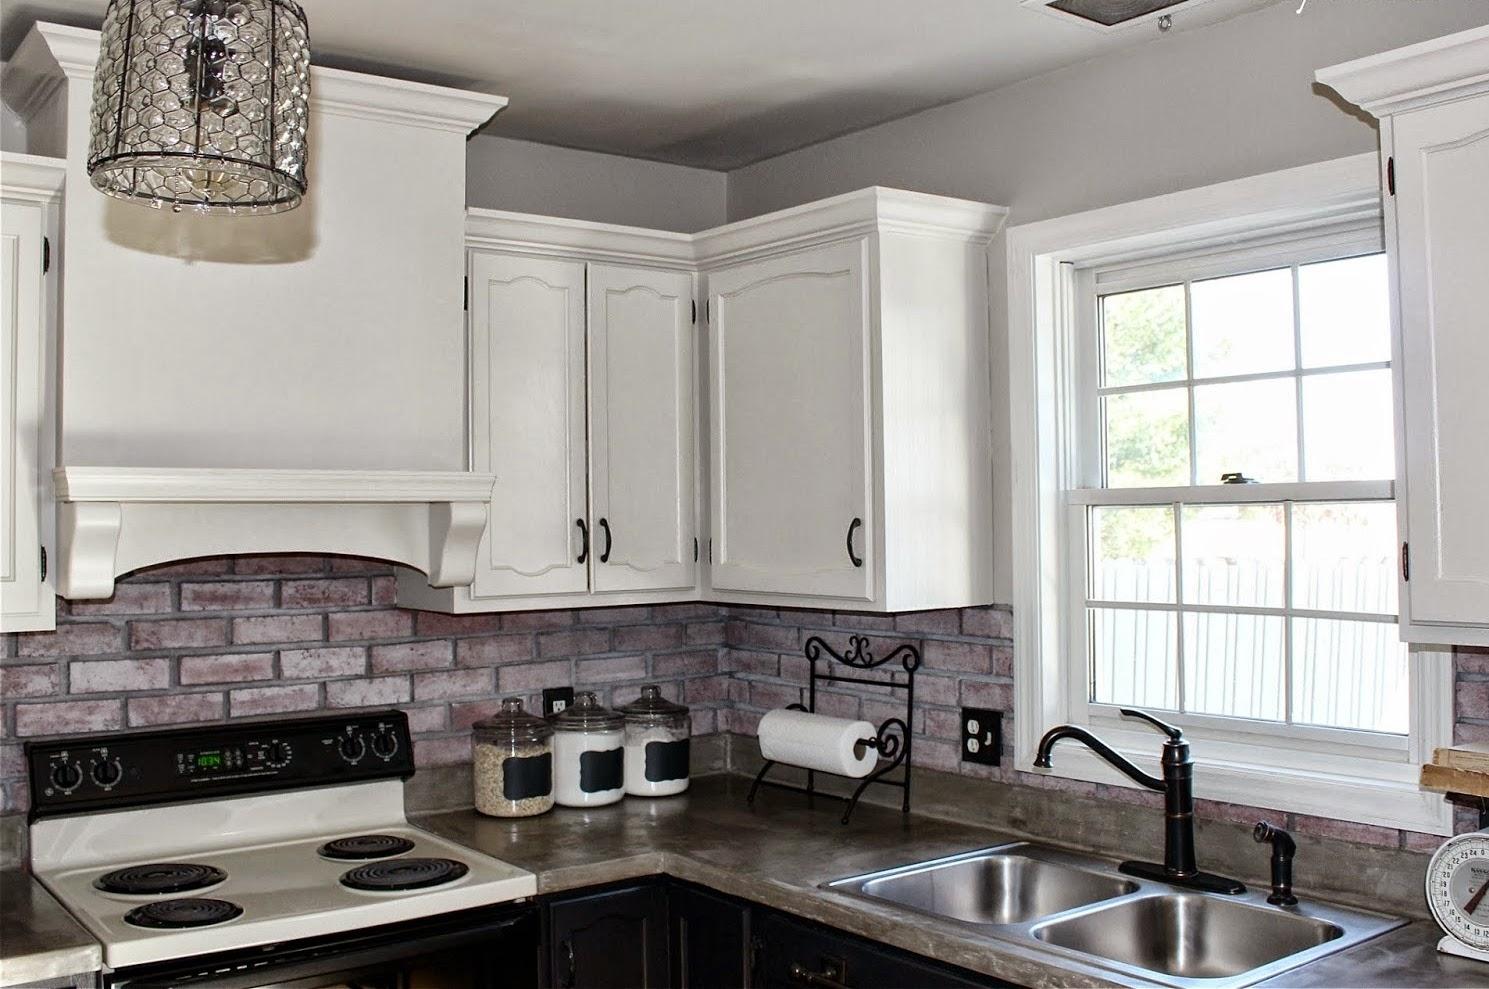 Home Priority Impressing Backsplash Through Brick Backsplash